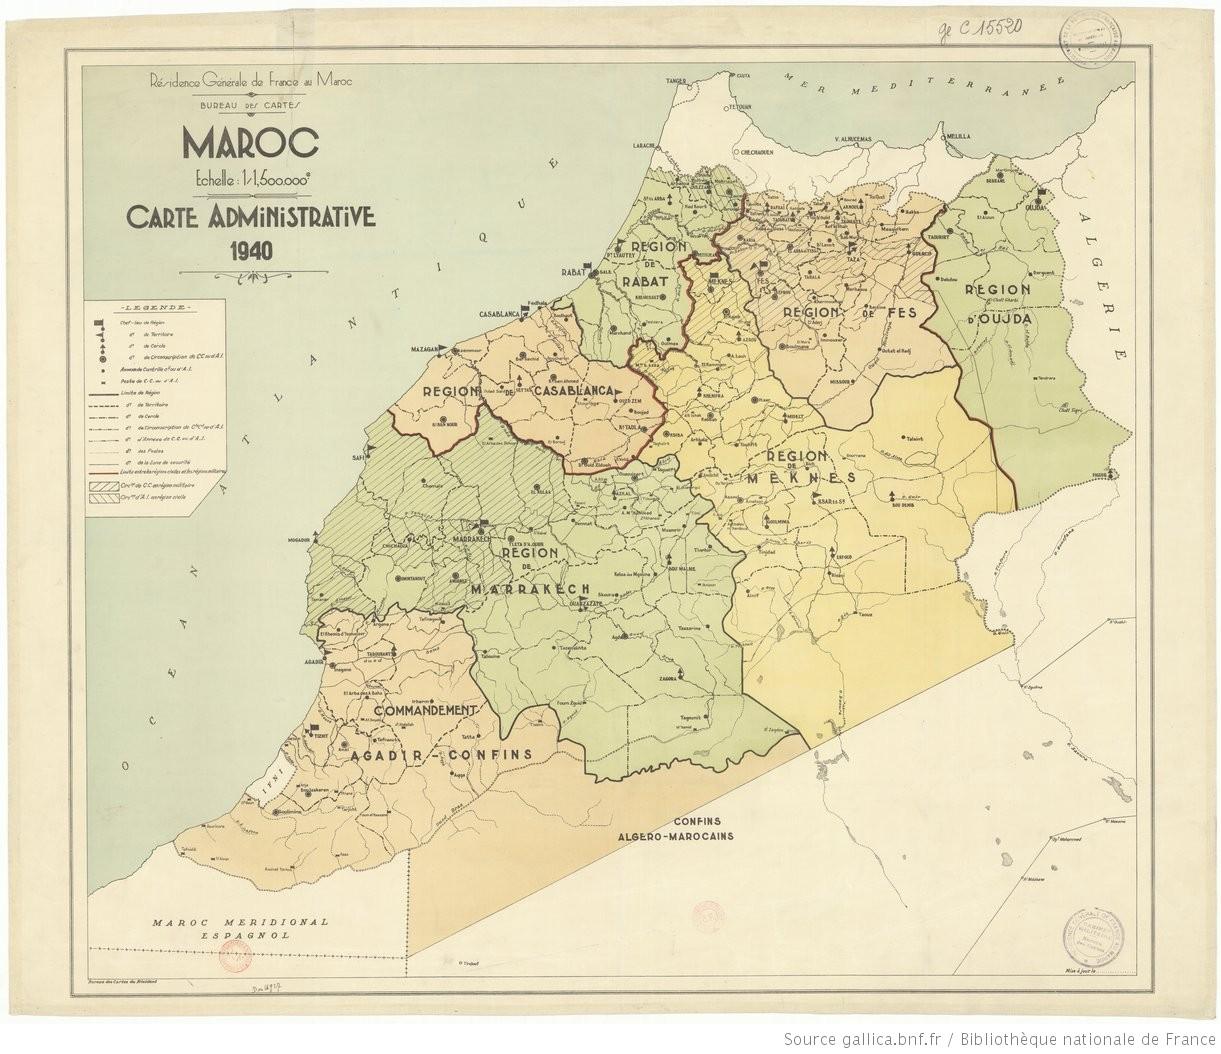 Maroc_1___1_500_[...]Maroc_Résidence_btv1b531212453.JPEG